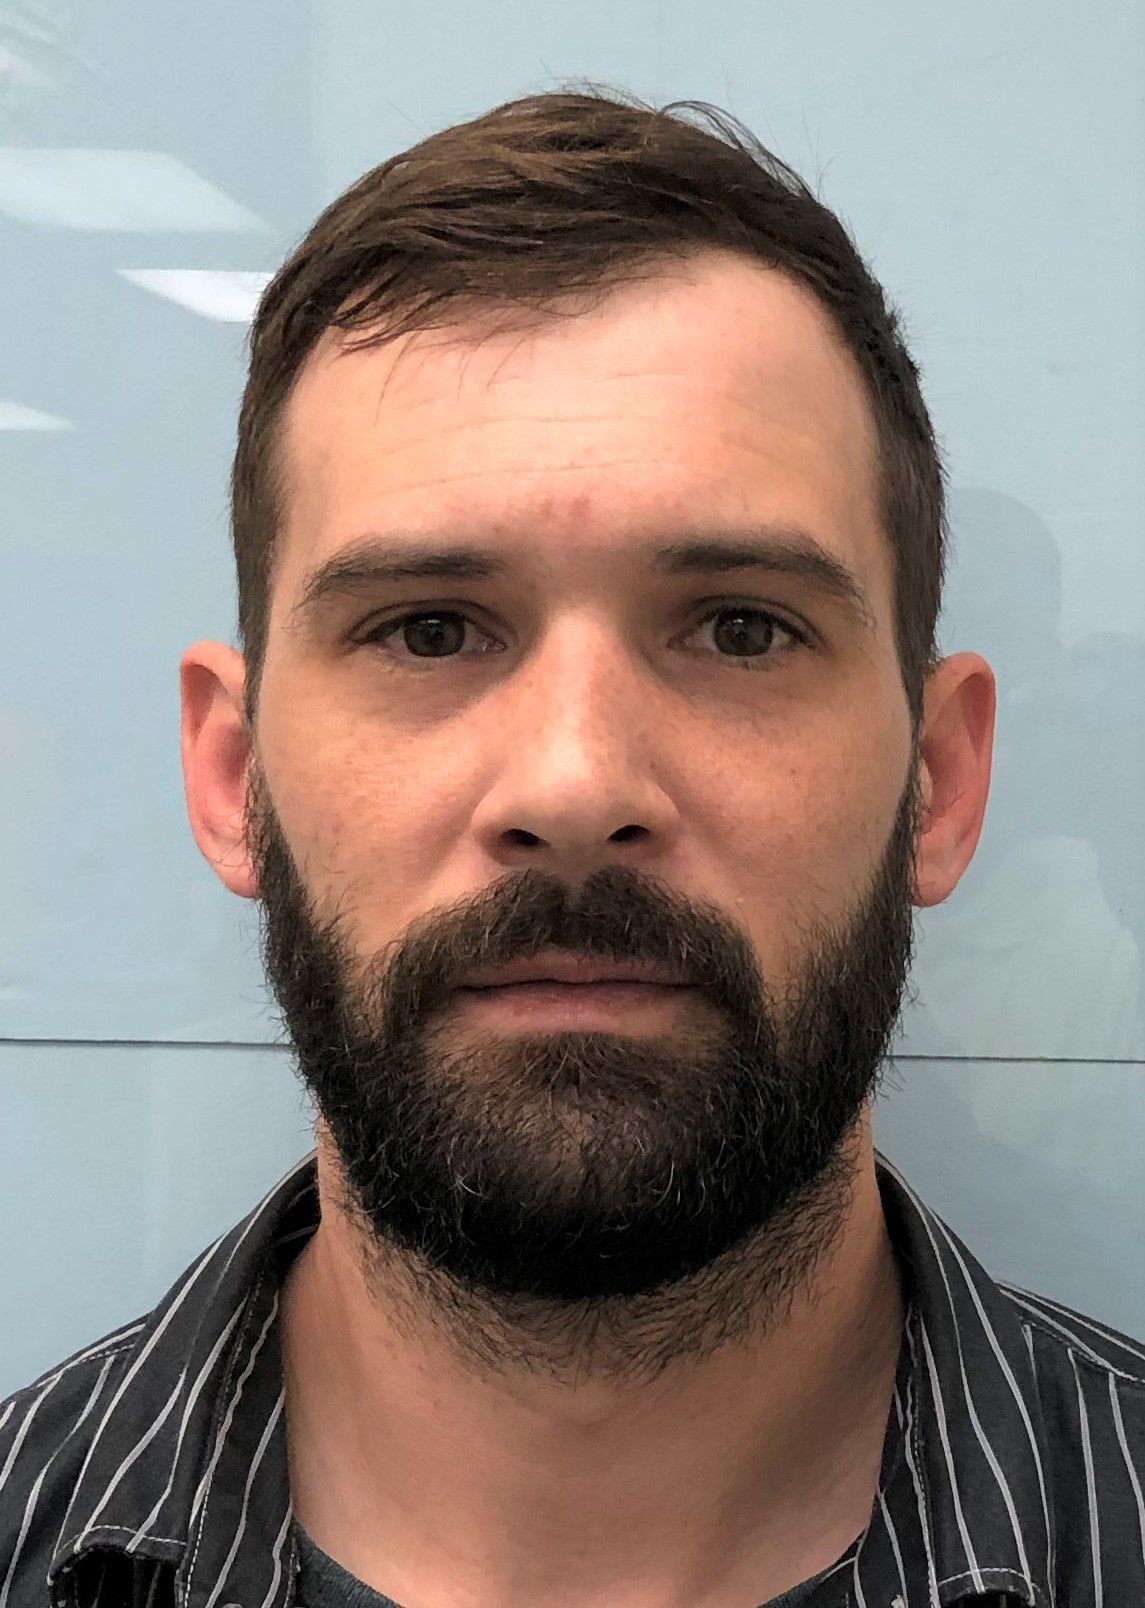 Lafayette County man charged with felony DUI | News | djournal com